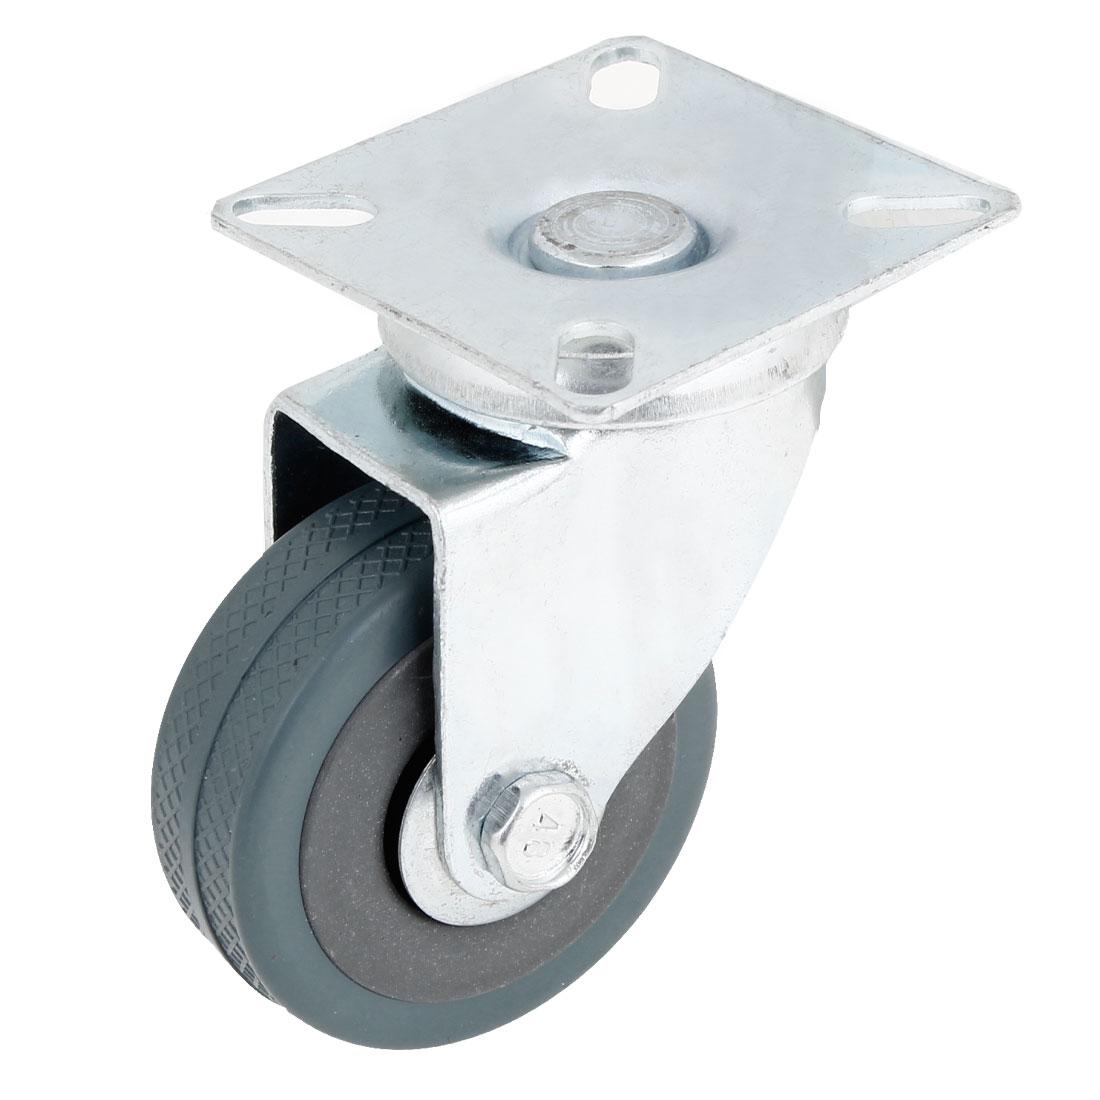 "2"" Diameter Metal Rotatable Flat Plate Plastic Single Wheel Caster"